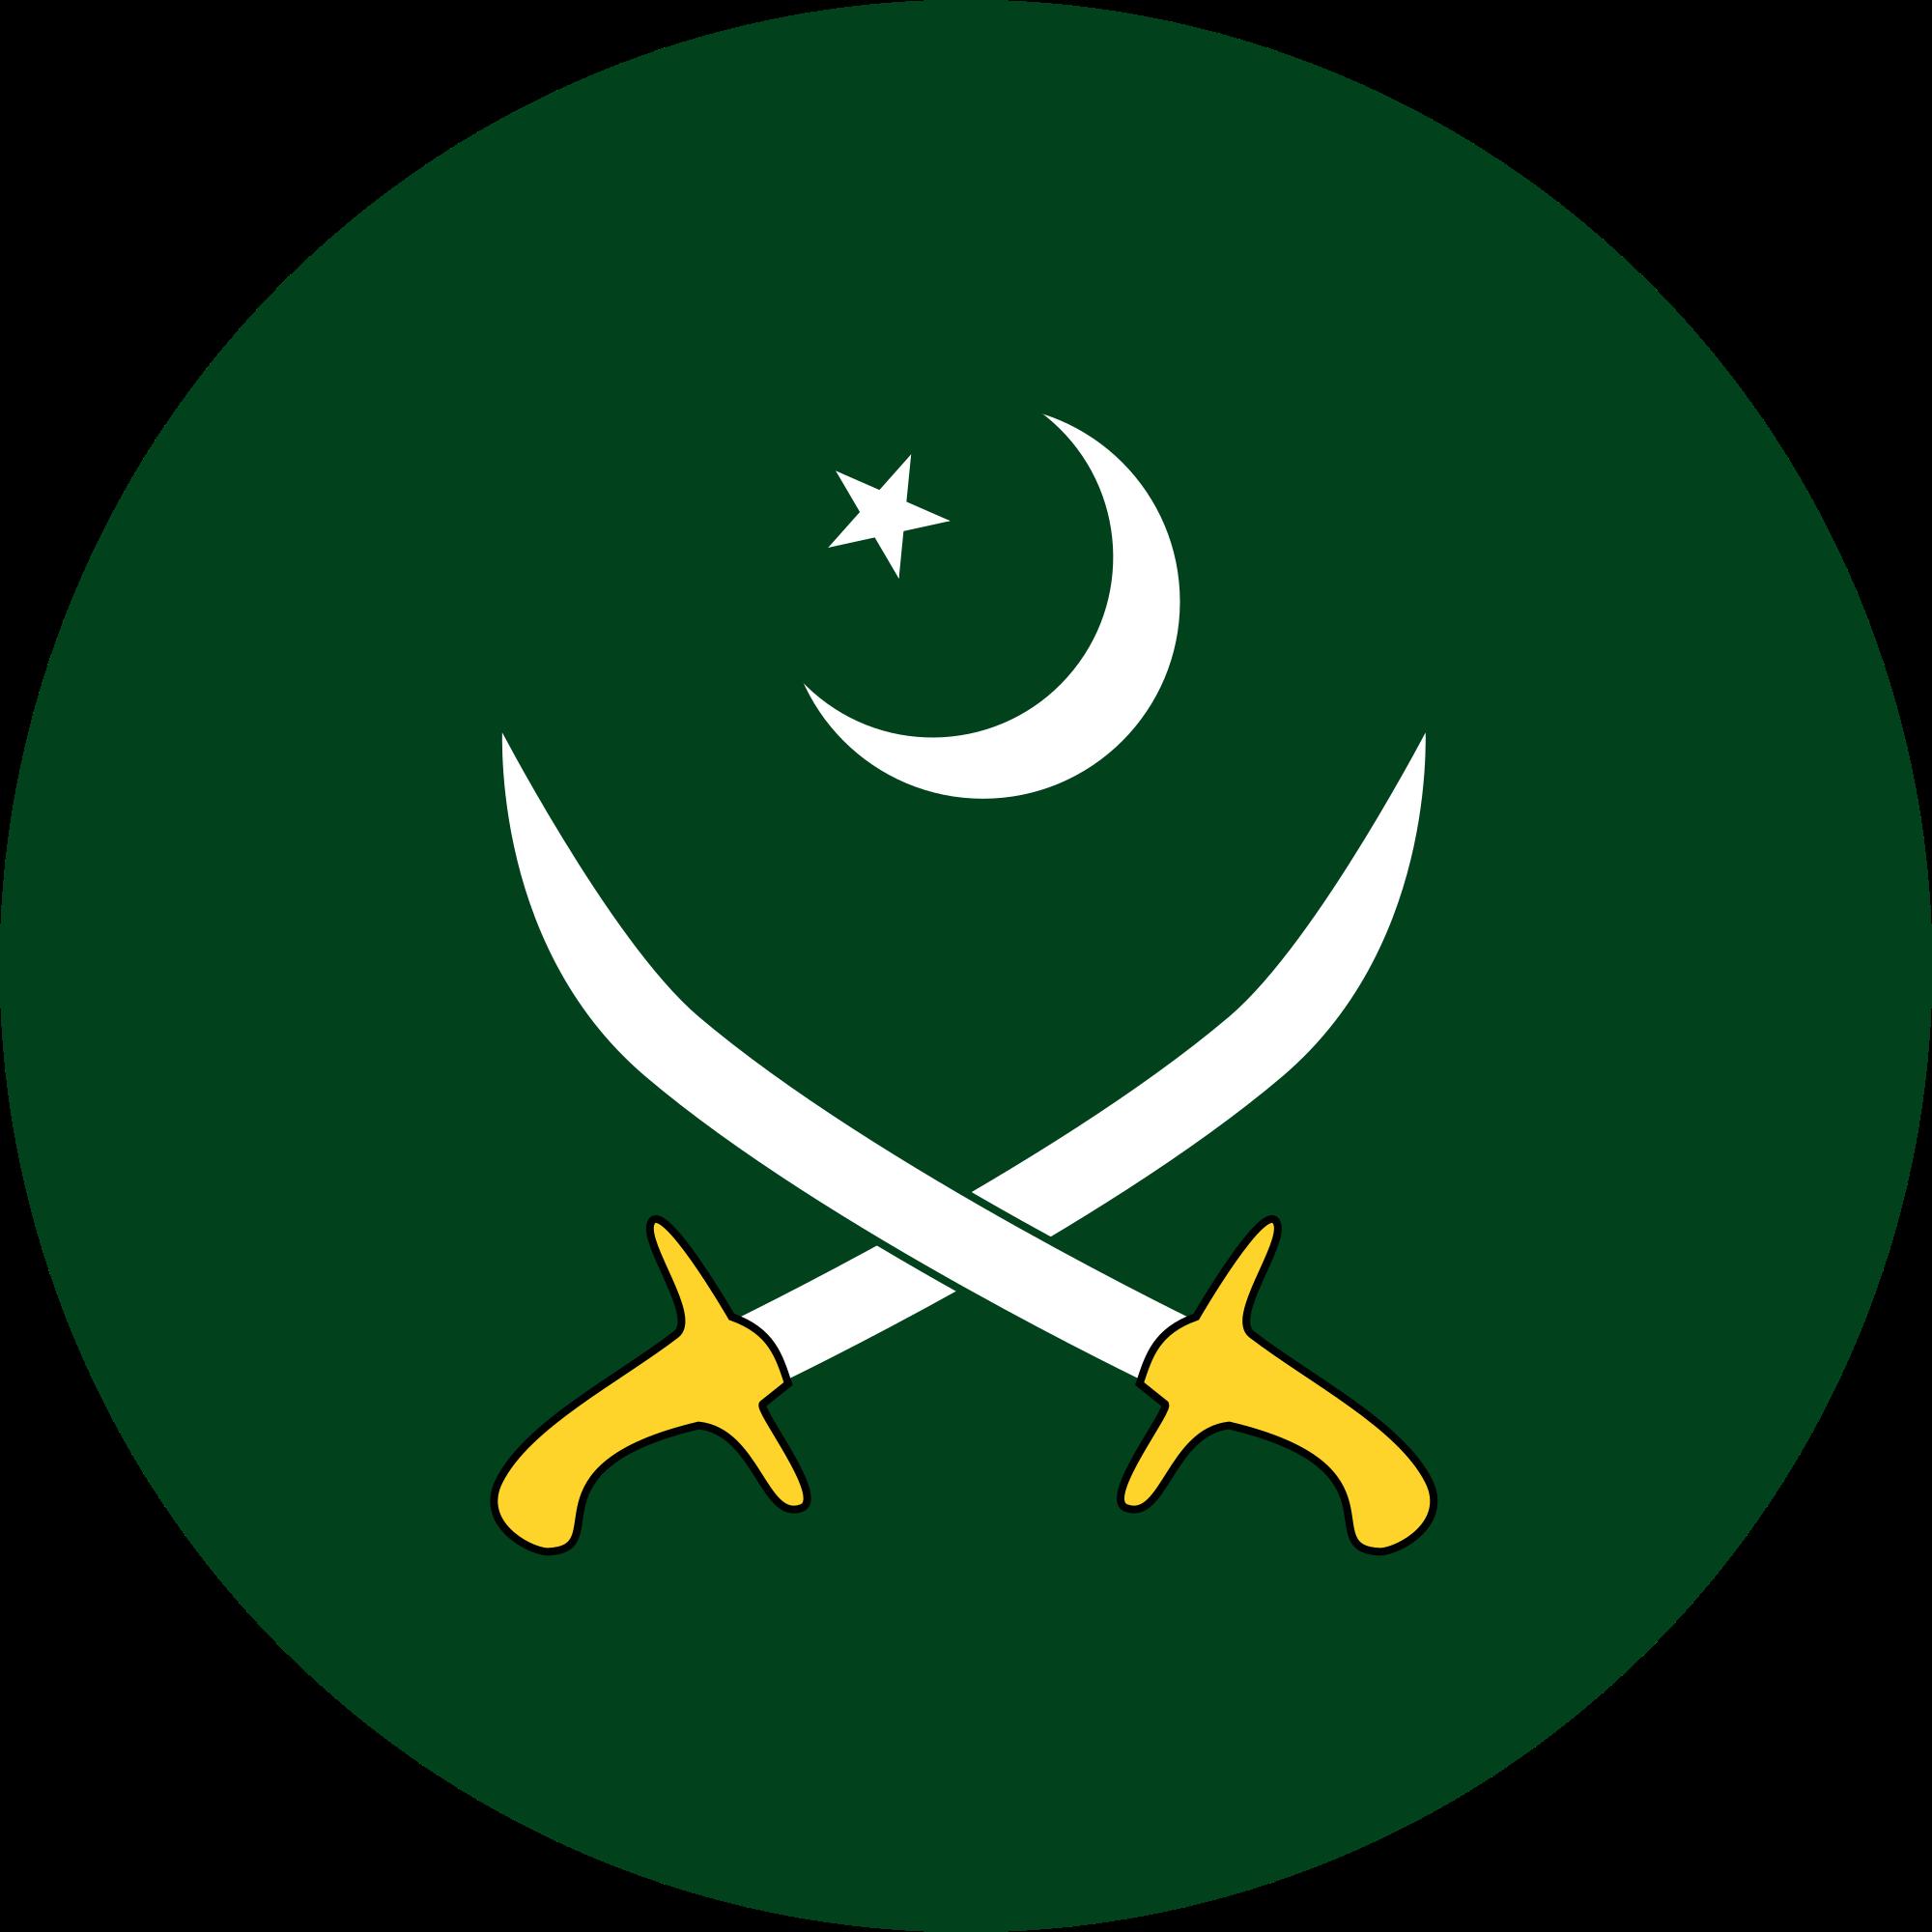 File:Pakistan Army Emblem.png.